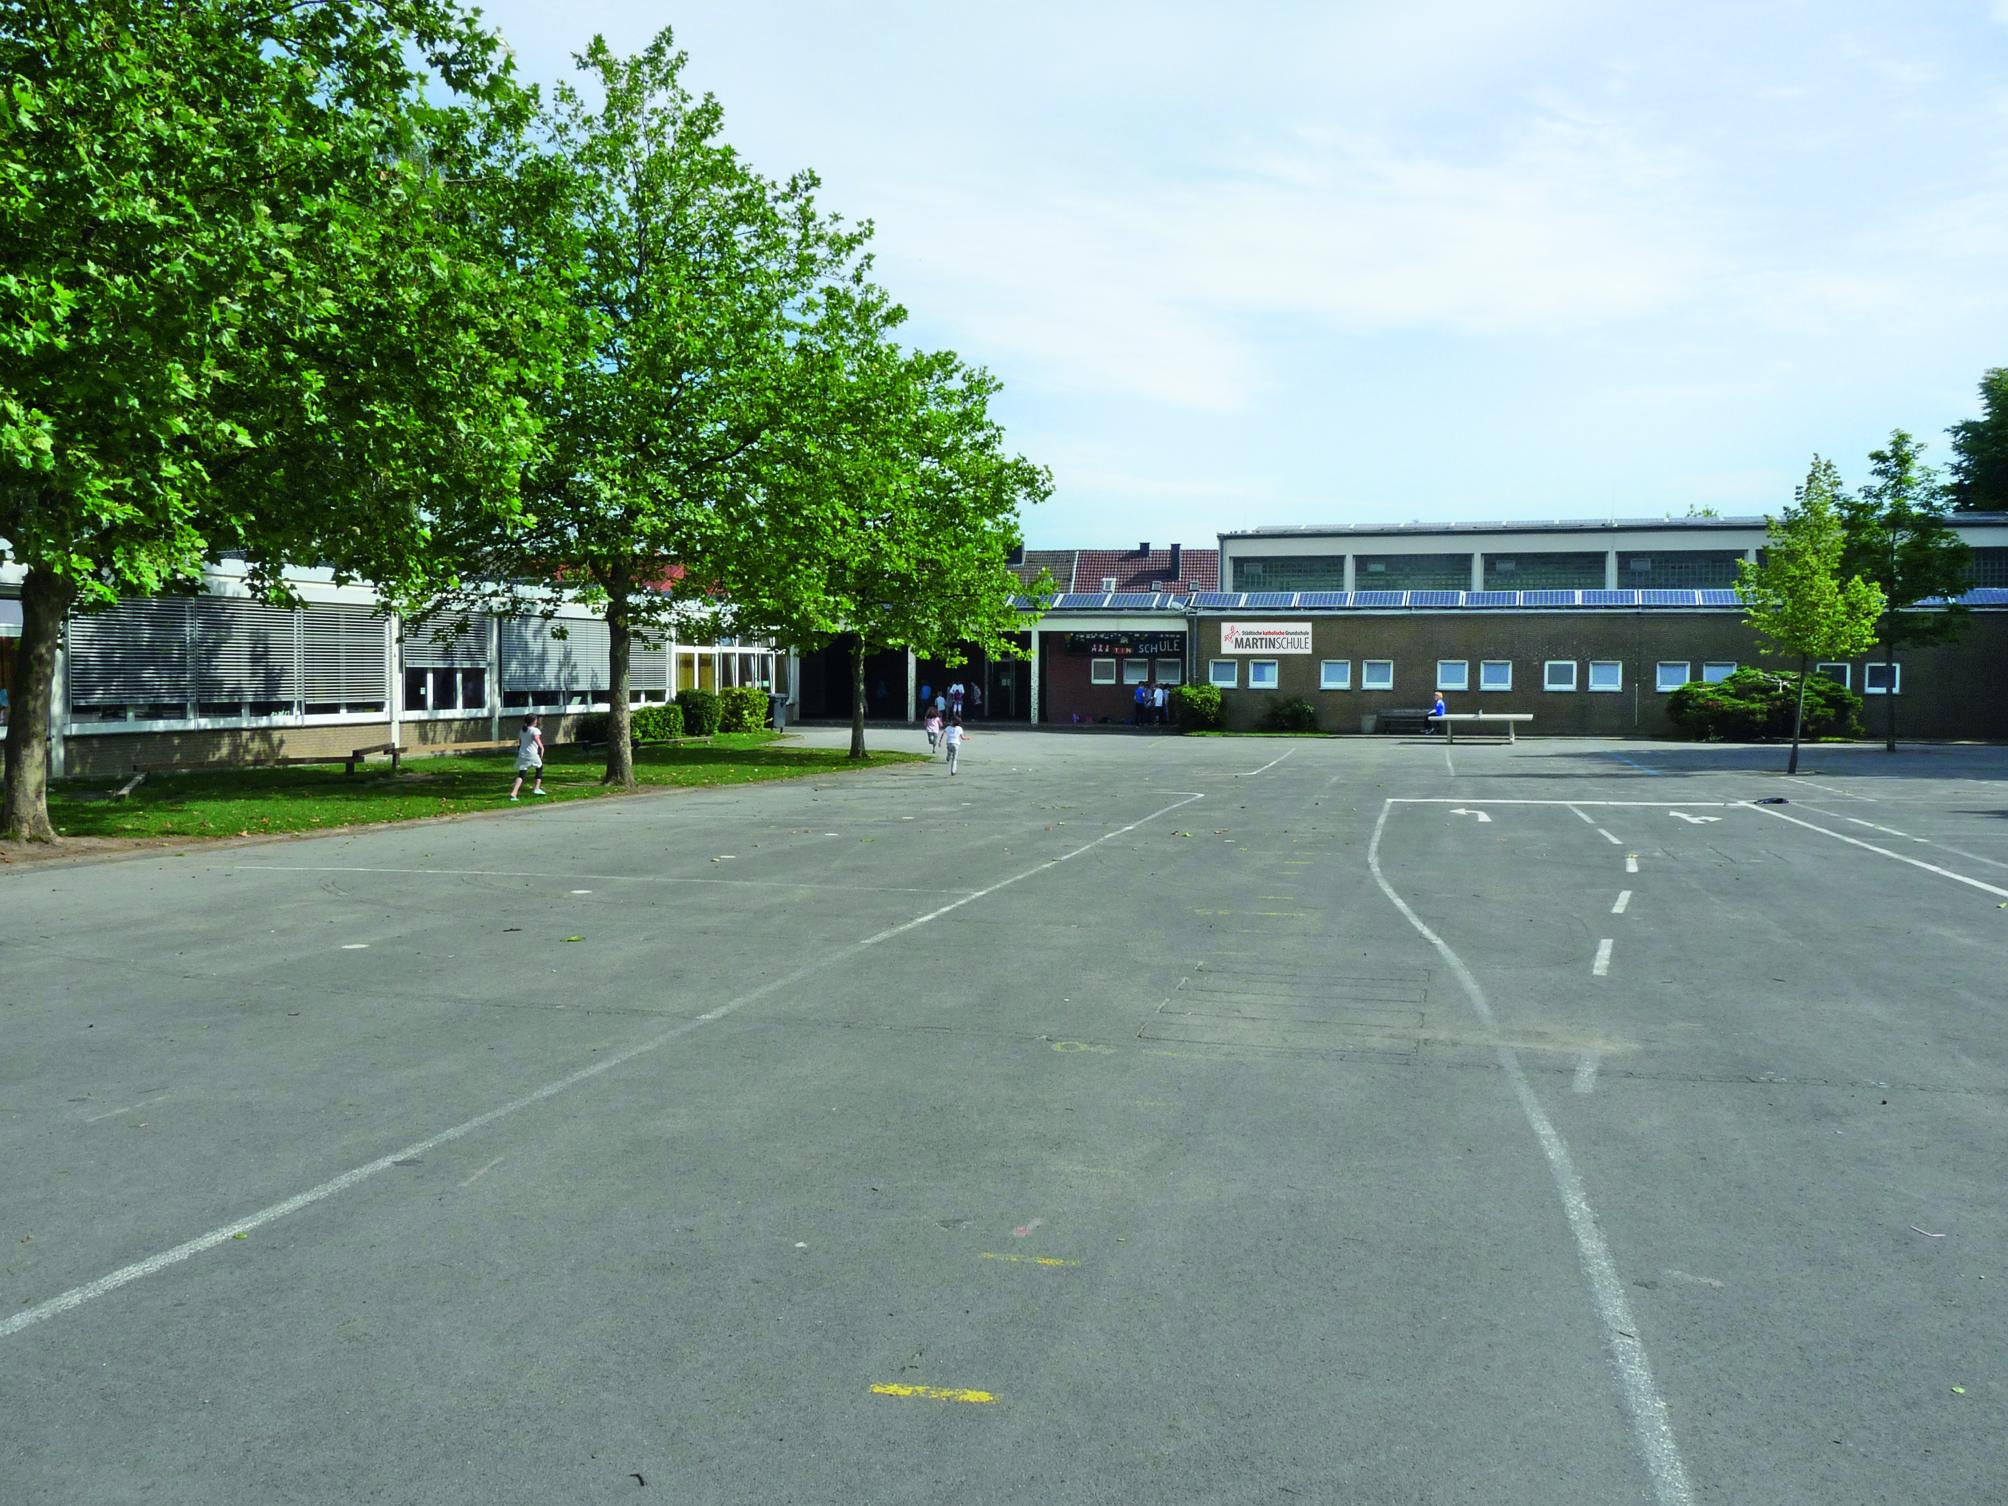 Martinschule Beckum – Einrichtungen